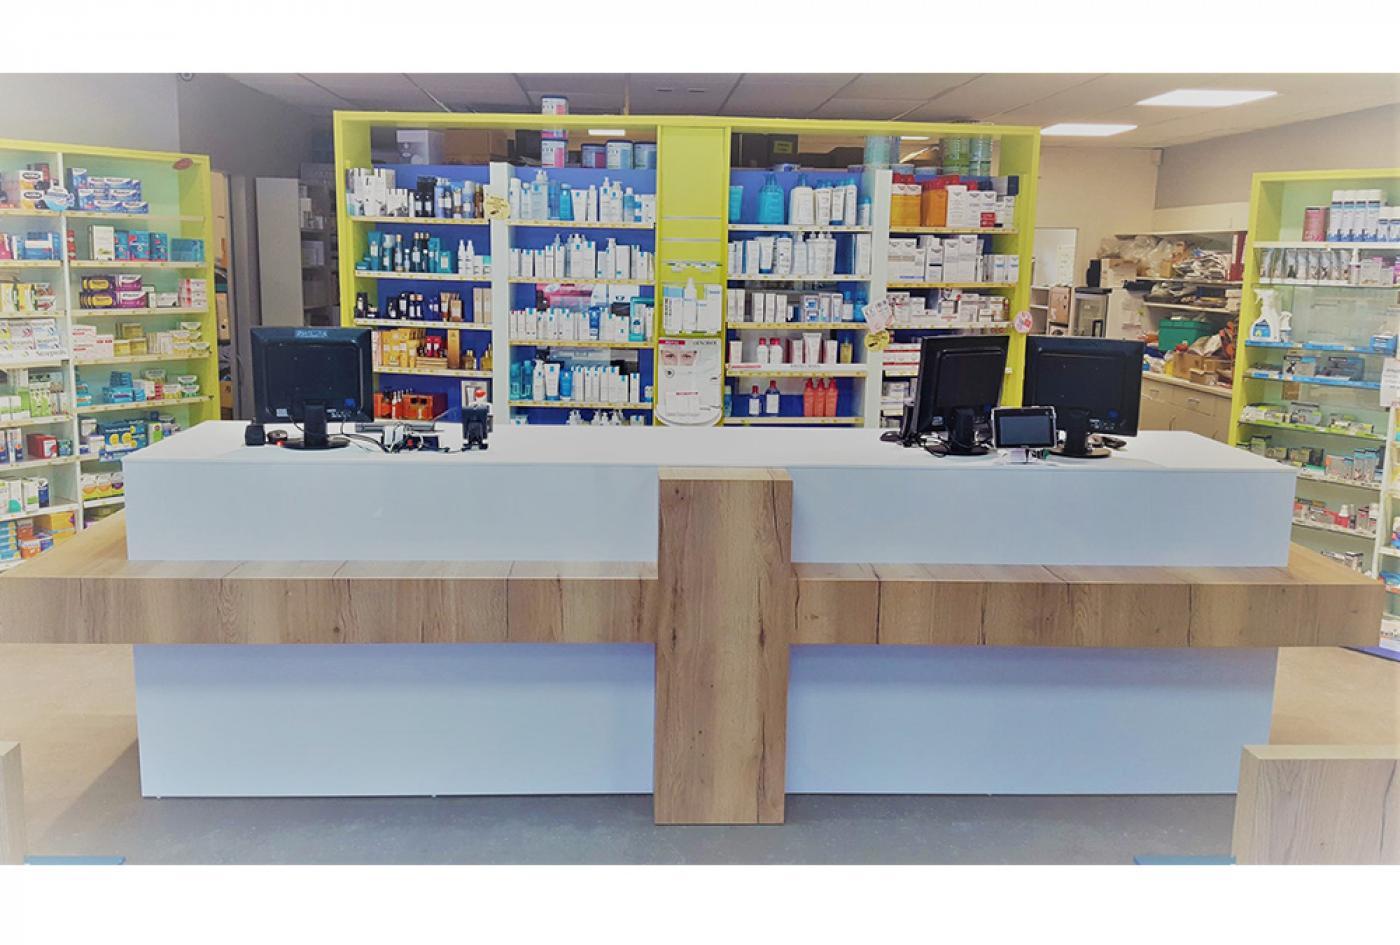 rénovation pharmacie saint-etienne